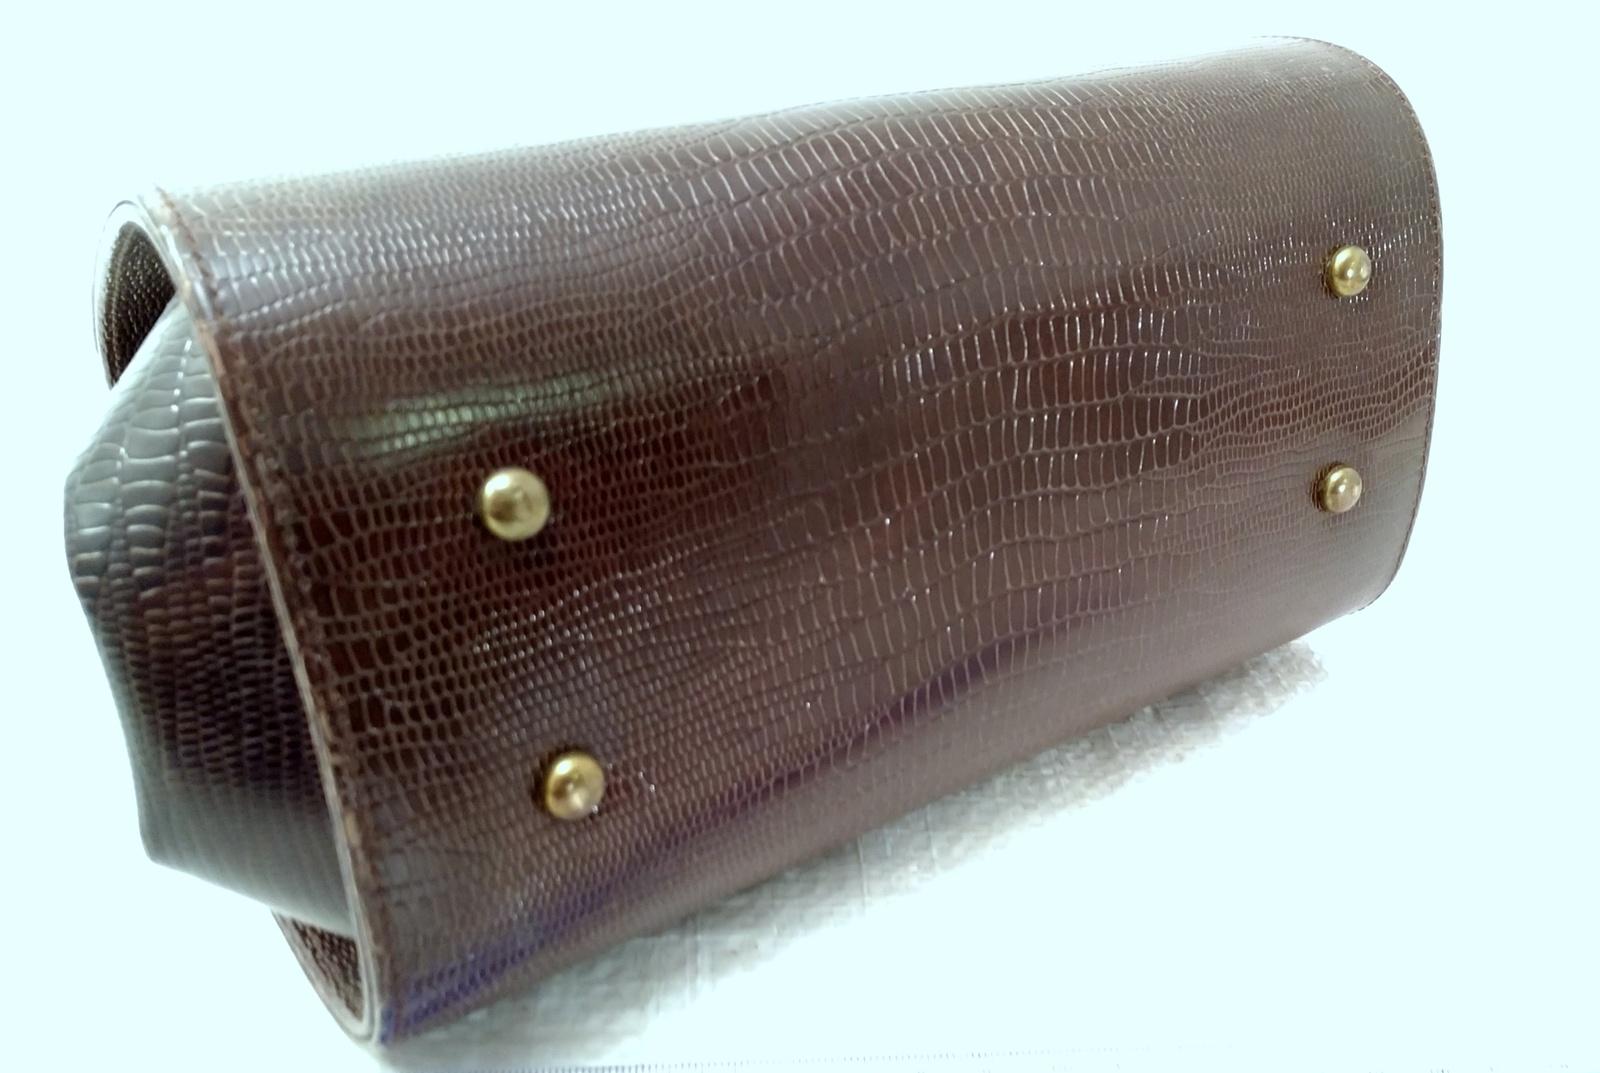 VINTAGE MEYERS Barrel HANDBAG Bag Purse